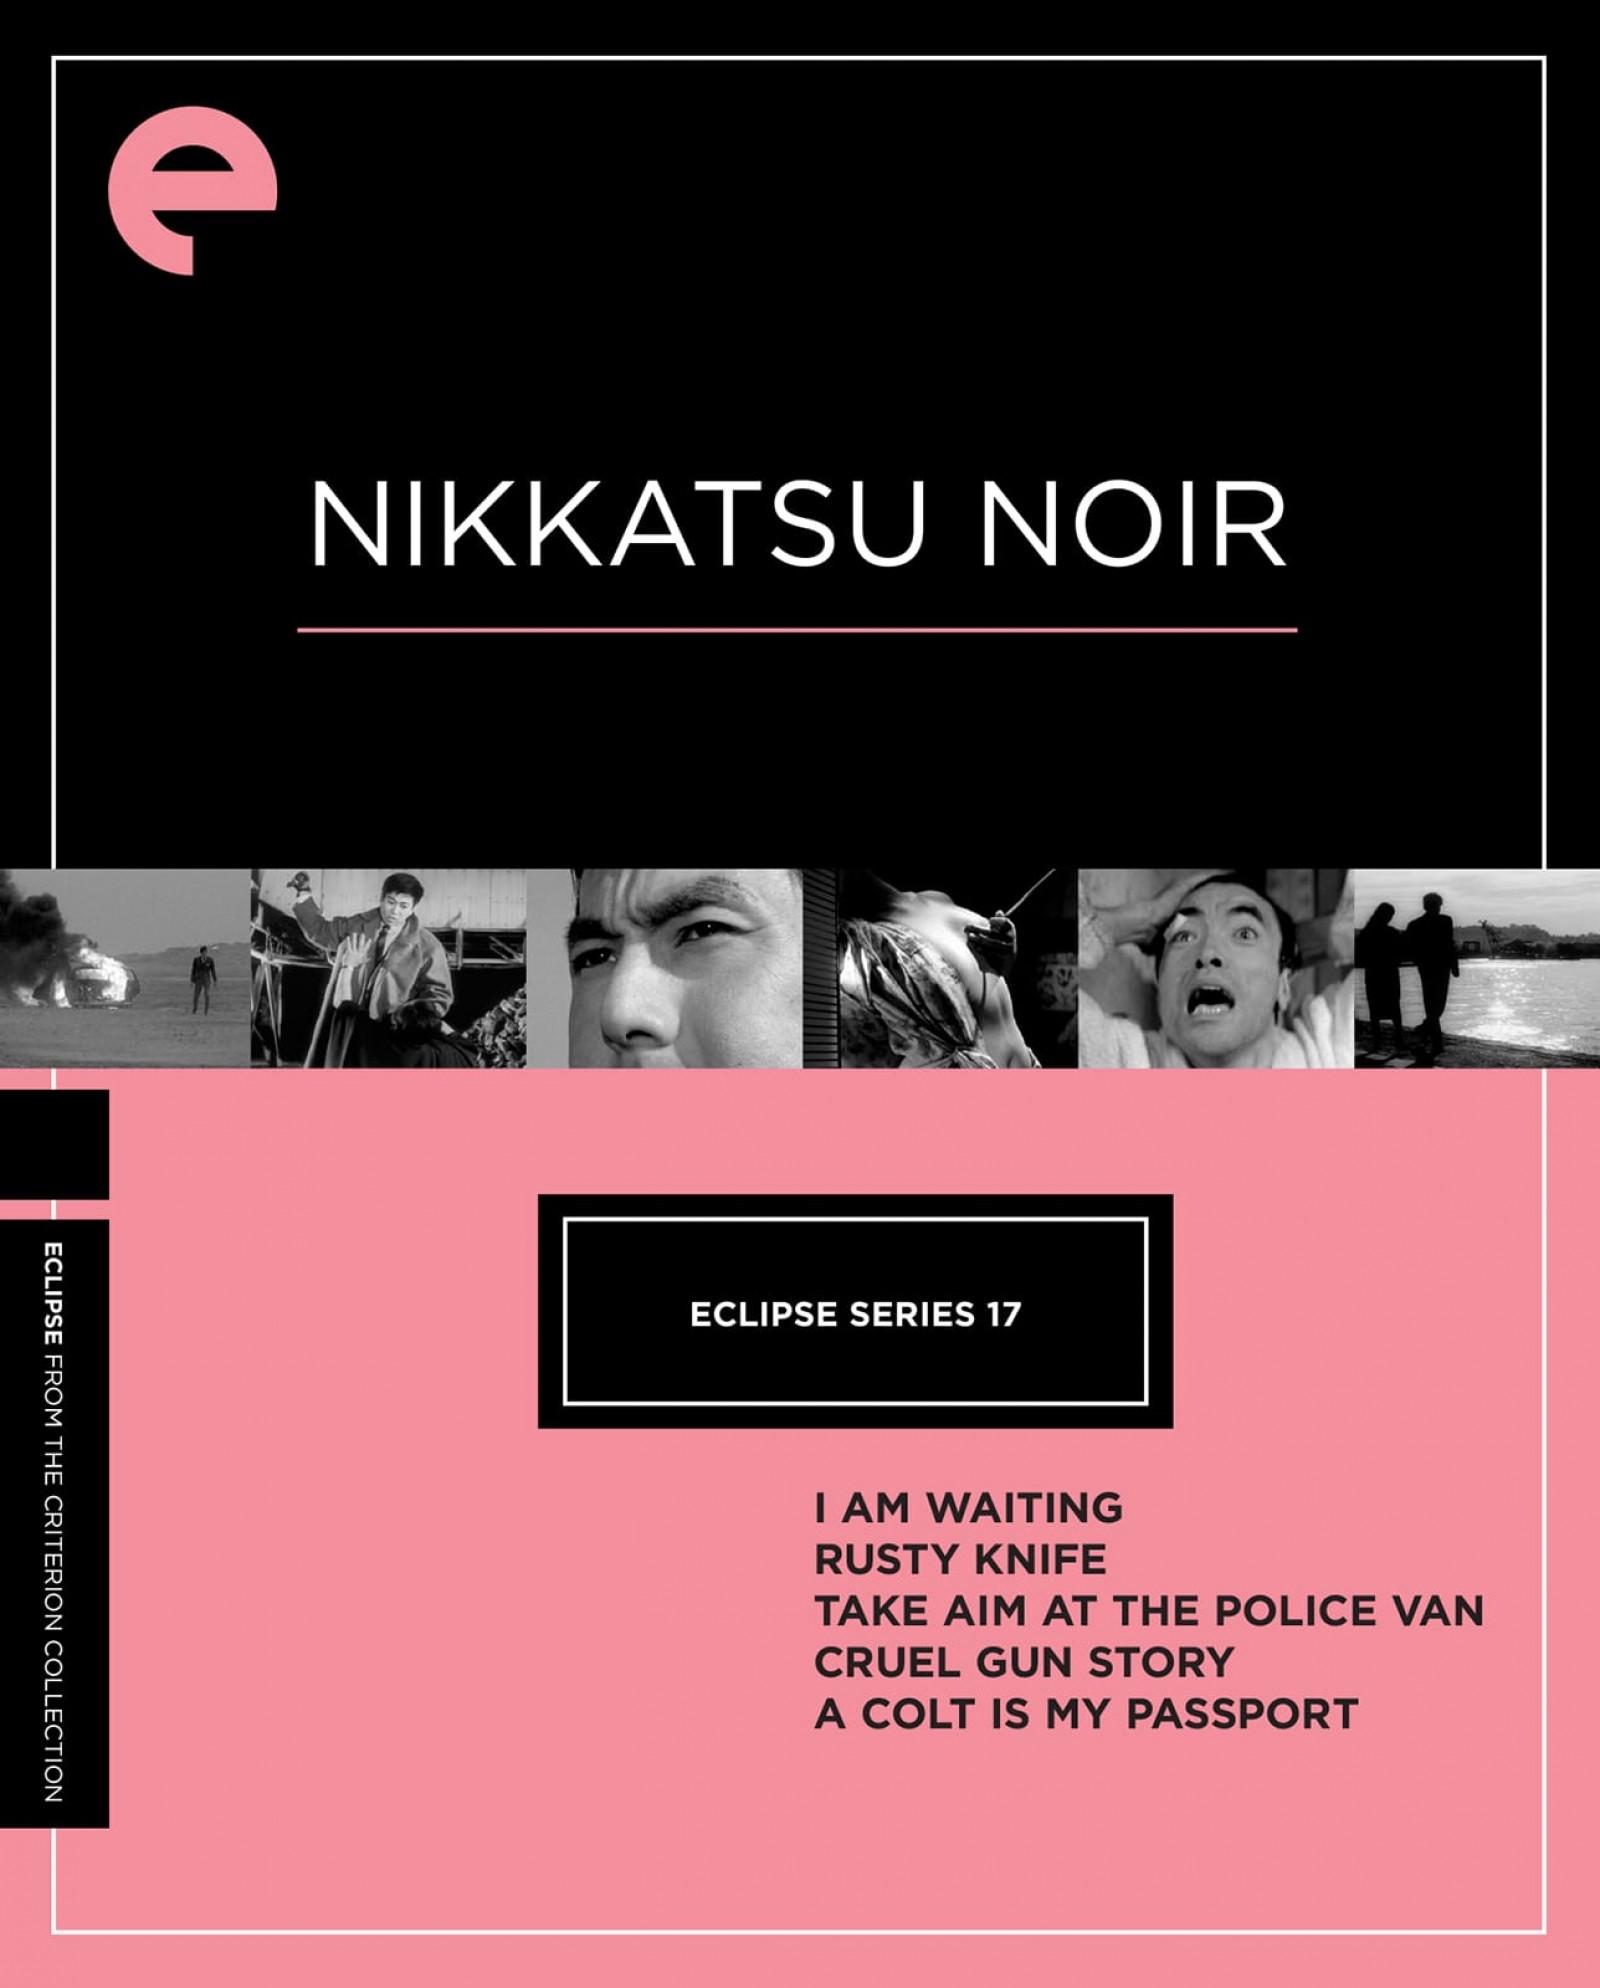 Eclipse Series 17: Nikkatsu Noir